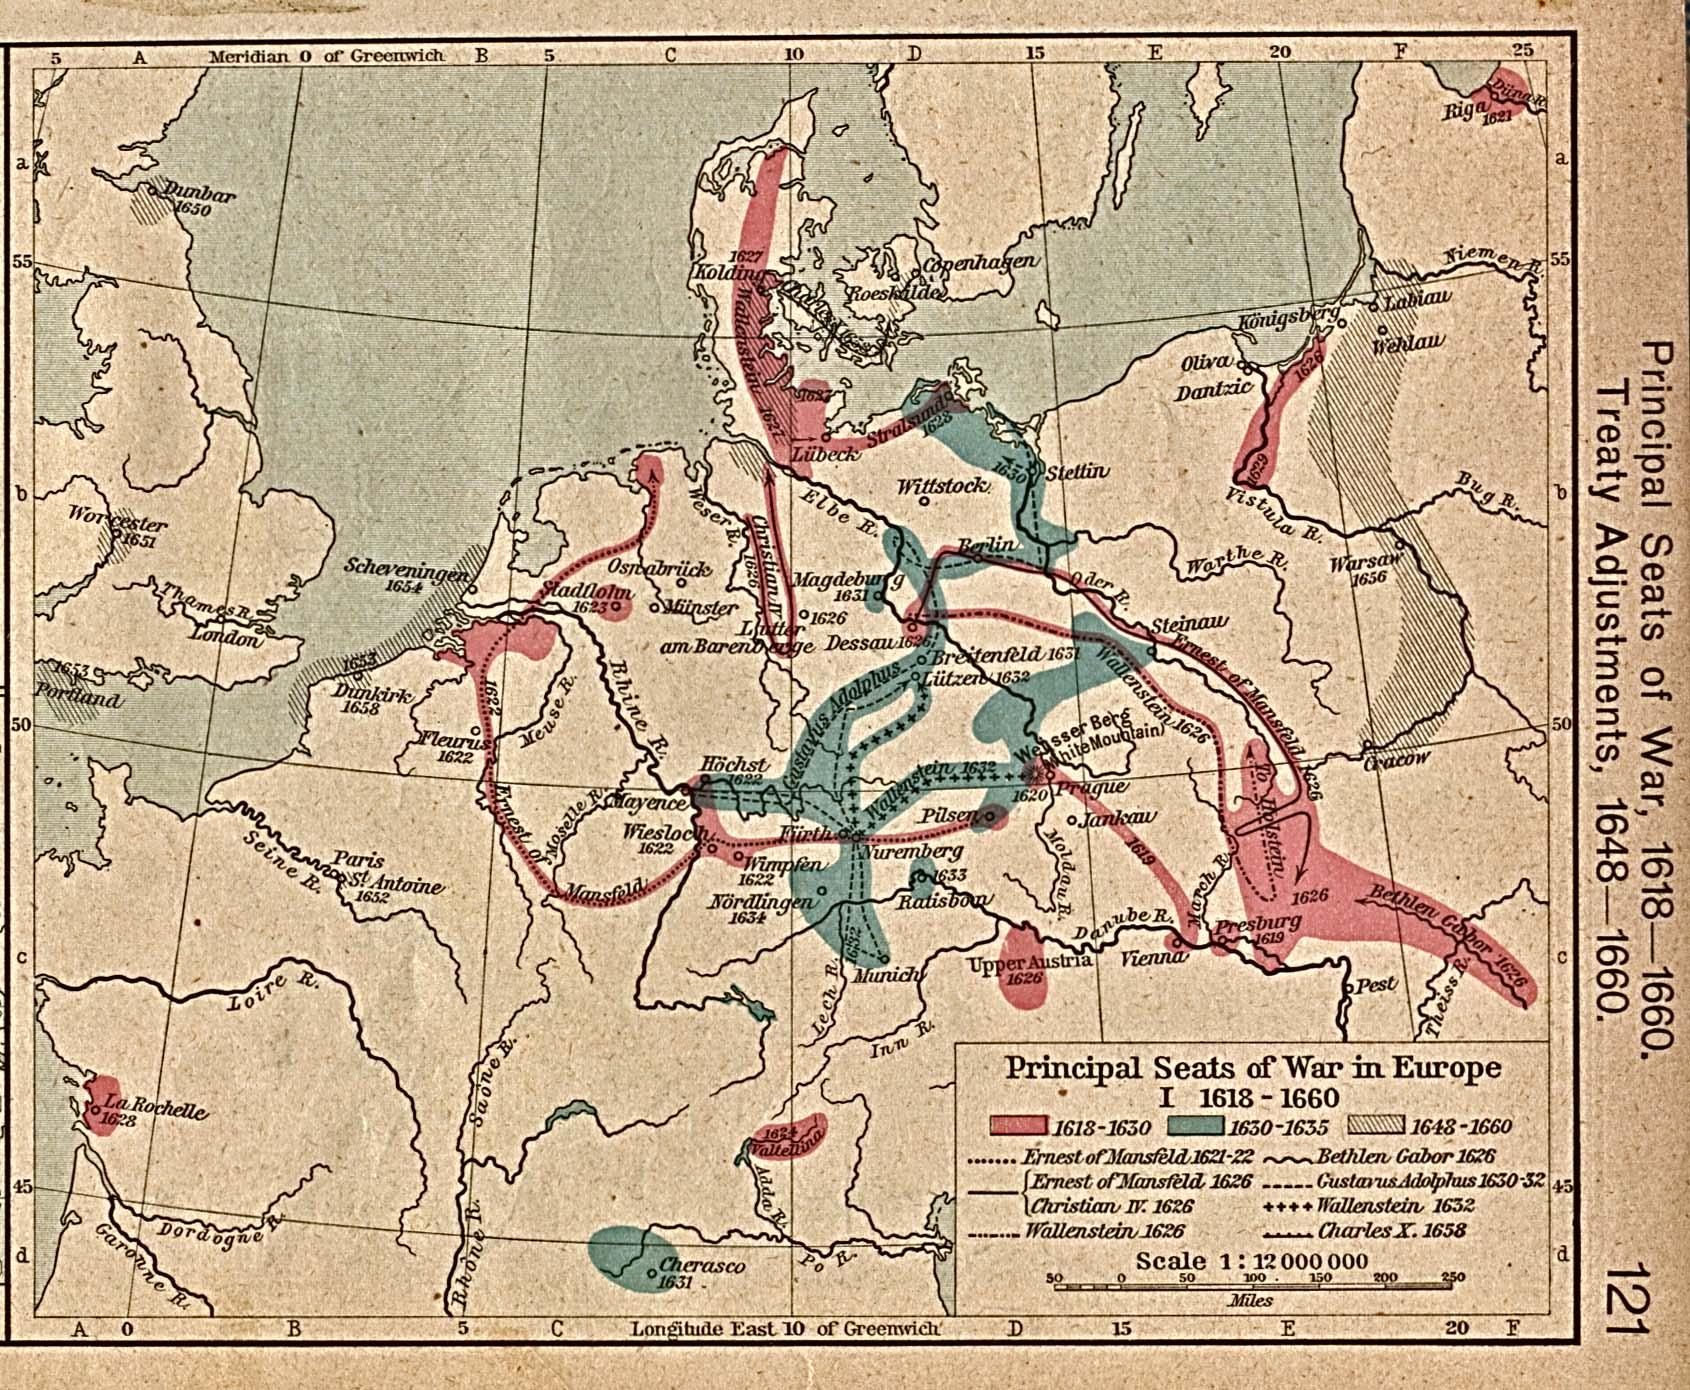 Principal seats of War in Europe 1618-1660